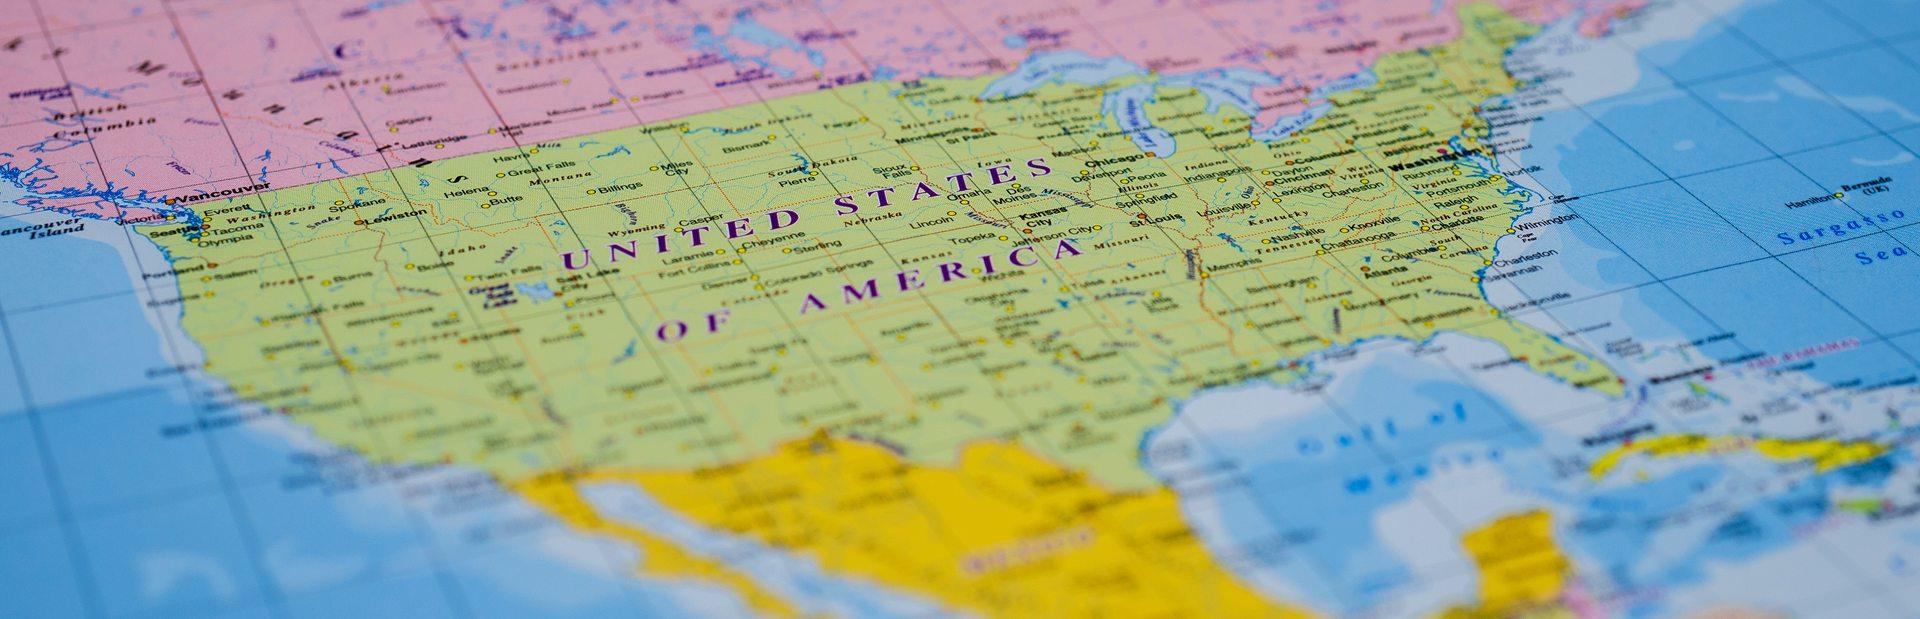 North America interactive map